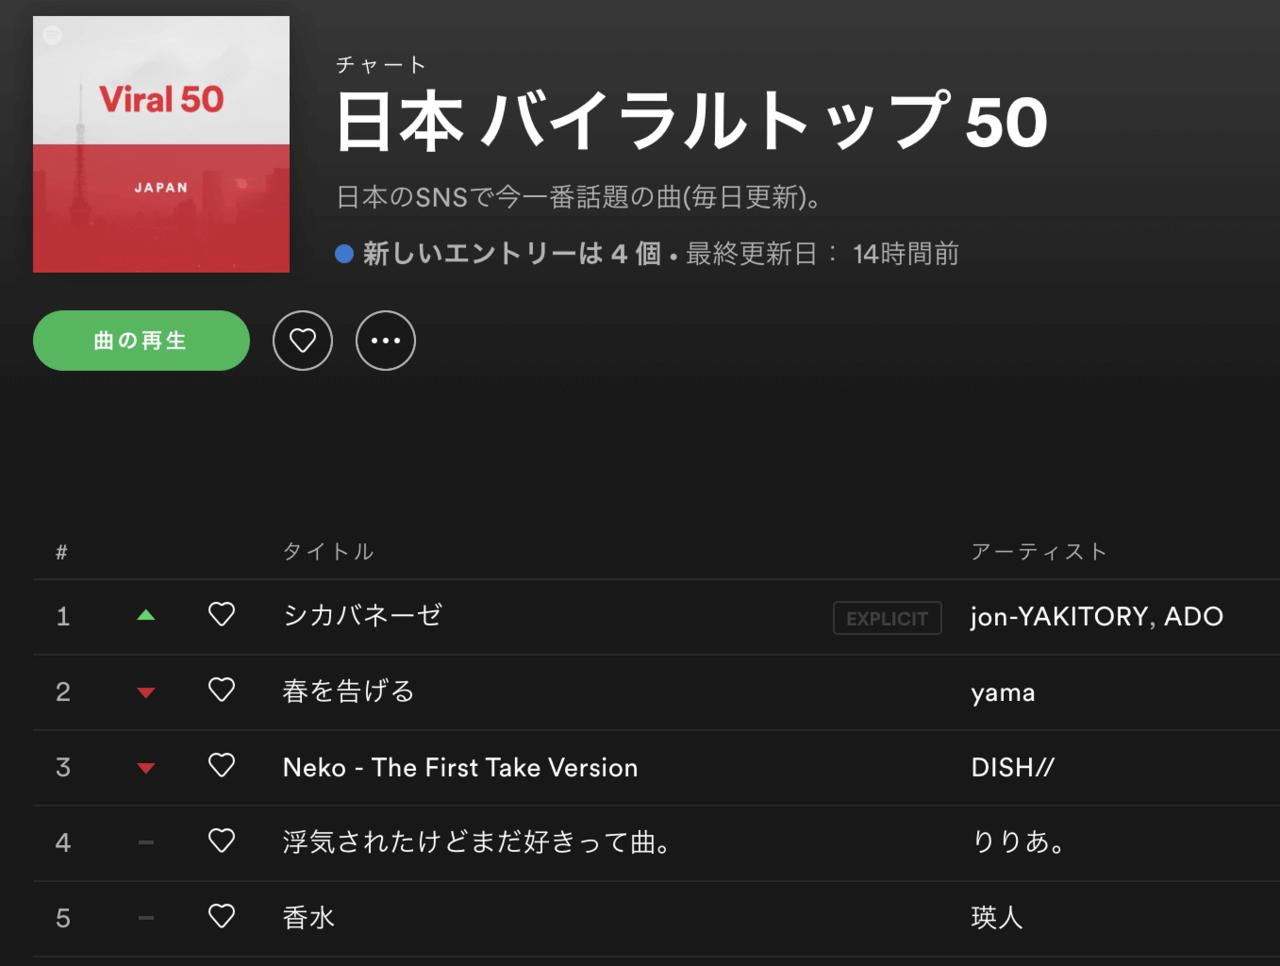 jon-YAKITORY インタビュー | Spotify Japanバイラルチャートで1位に急上昇、ボカロPとしても活動する注目アーティスト【Who's NXT】